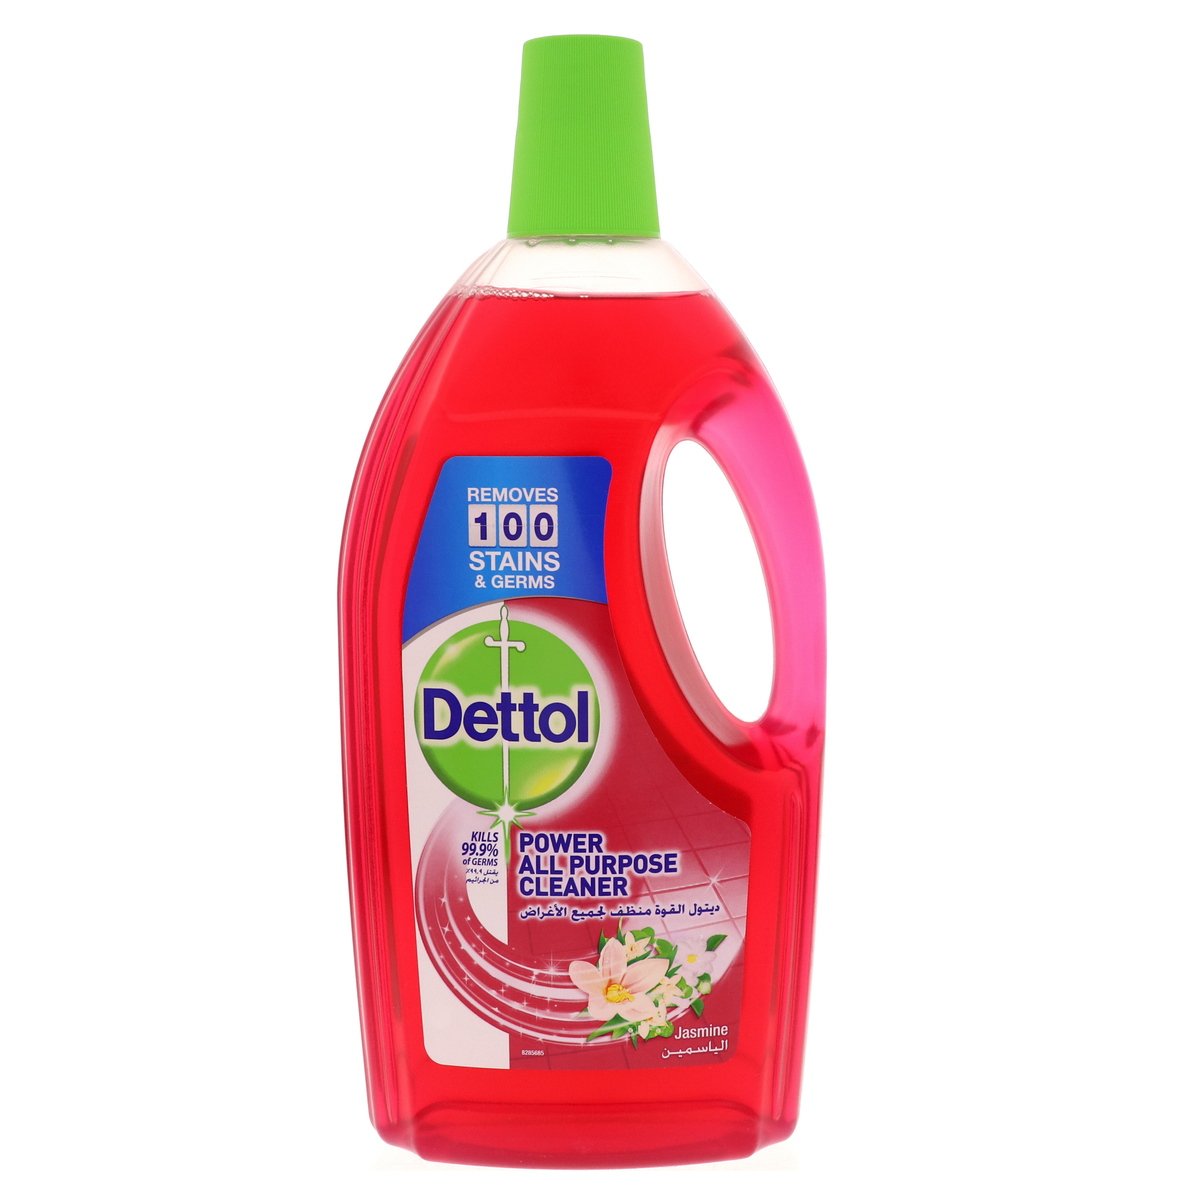 Dettol Power All-Purpose Cleaner Jasmine - 900ml (pc)